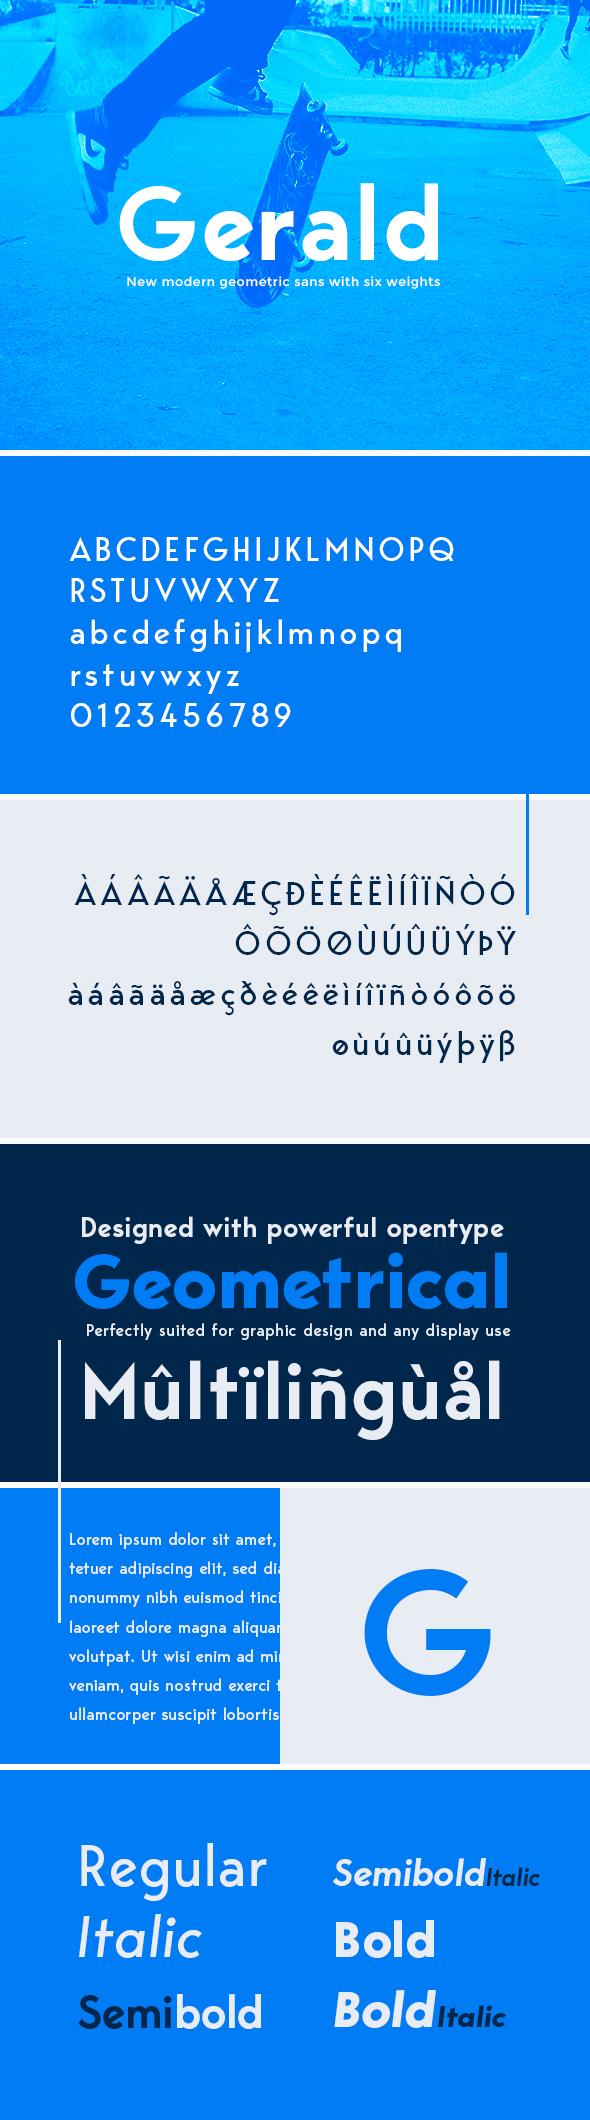 Gerald Sans Font - Geometric Modern Typeface